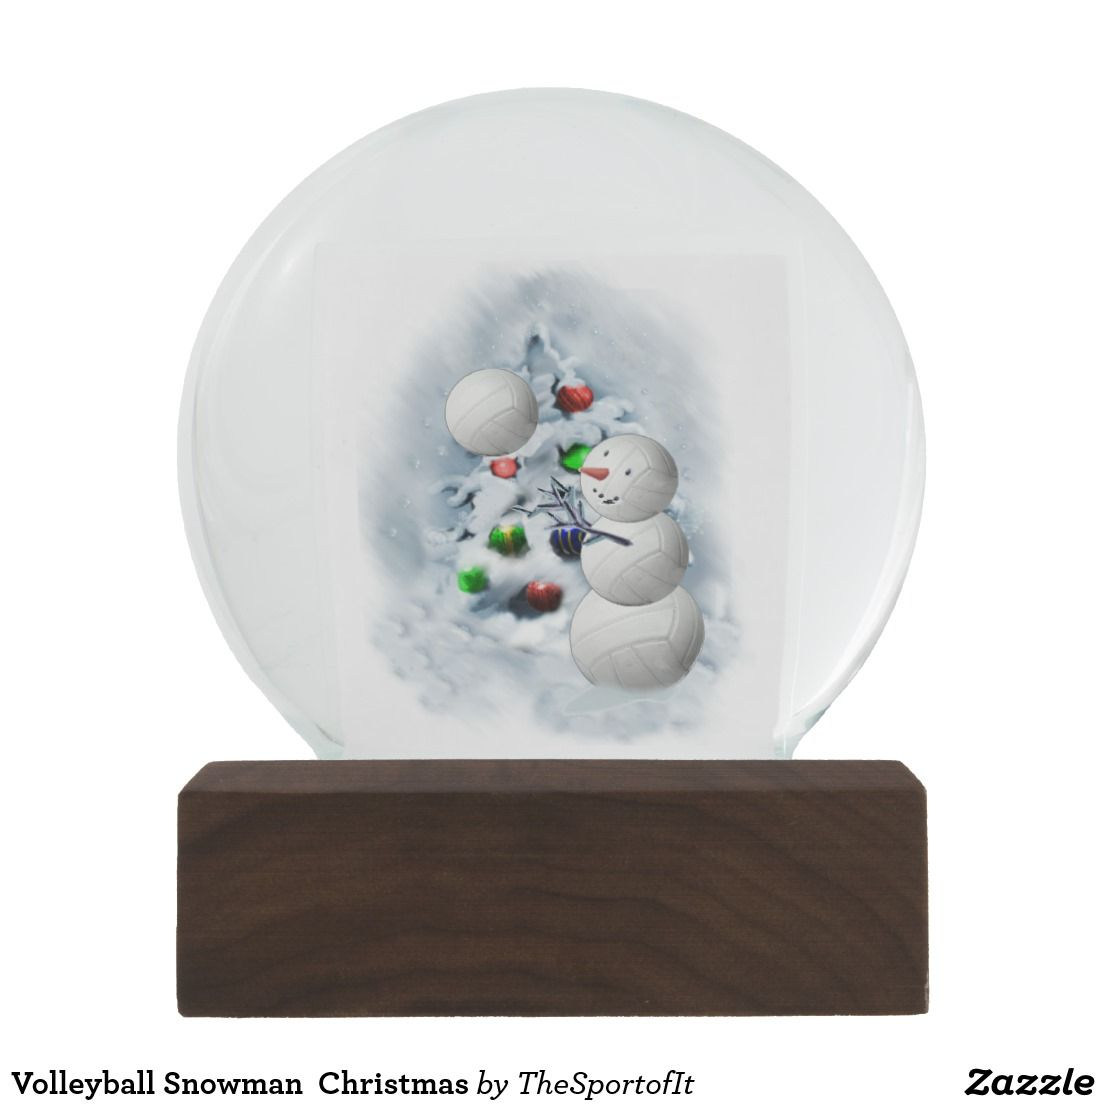 Volleyball Snowman Christmas Snow Globe Zazzle Com Christmas Snow Globes Snow Globes Christmas Snowman